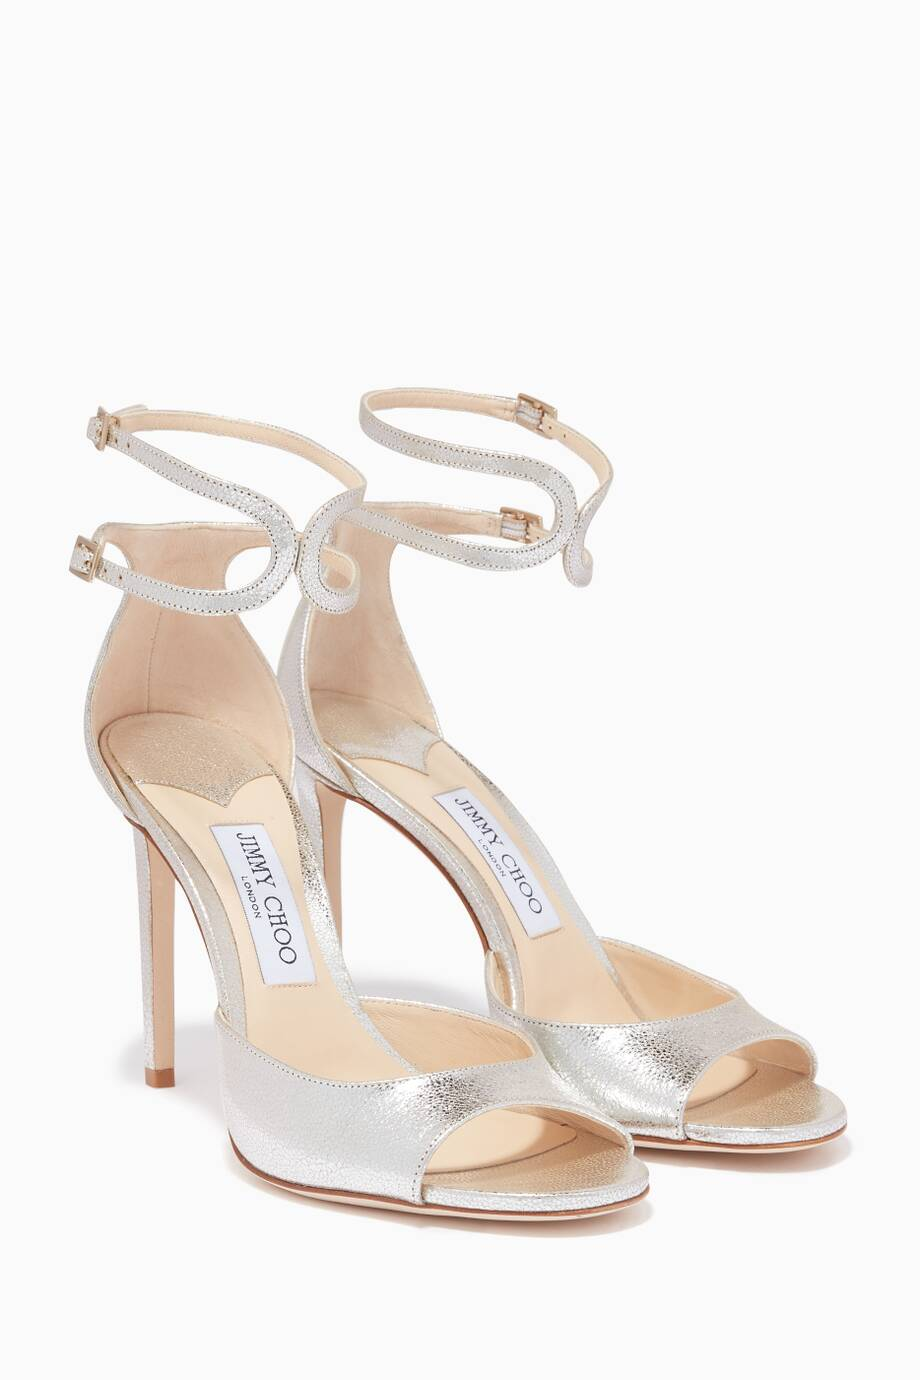 09d56f365c1 Shop Luxury Jimmy Choo Champagne Metallic Lane 100 Sandals